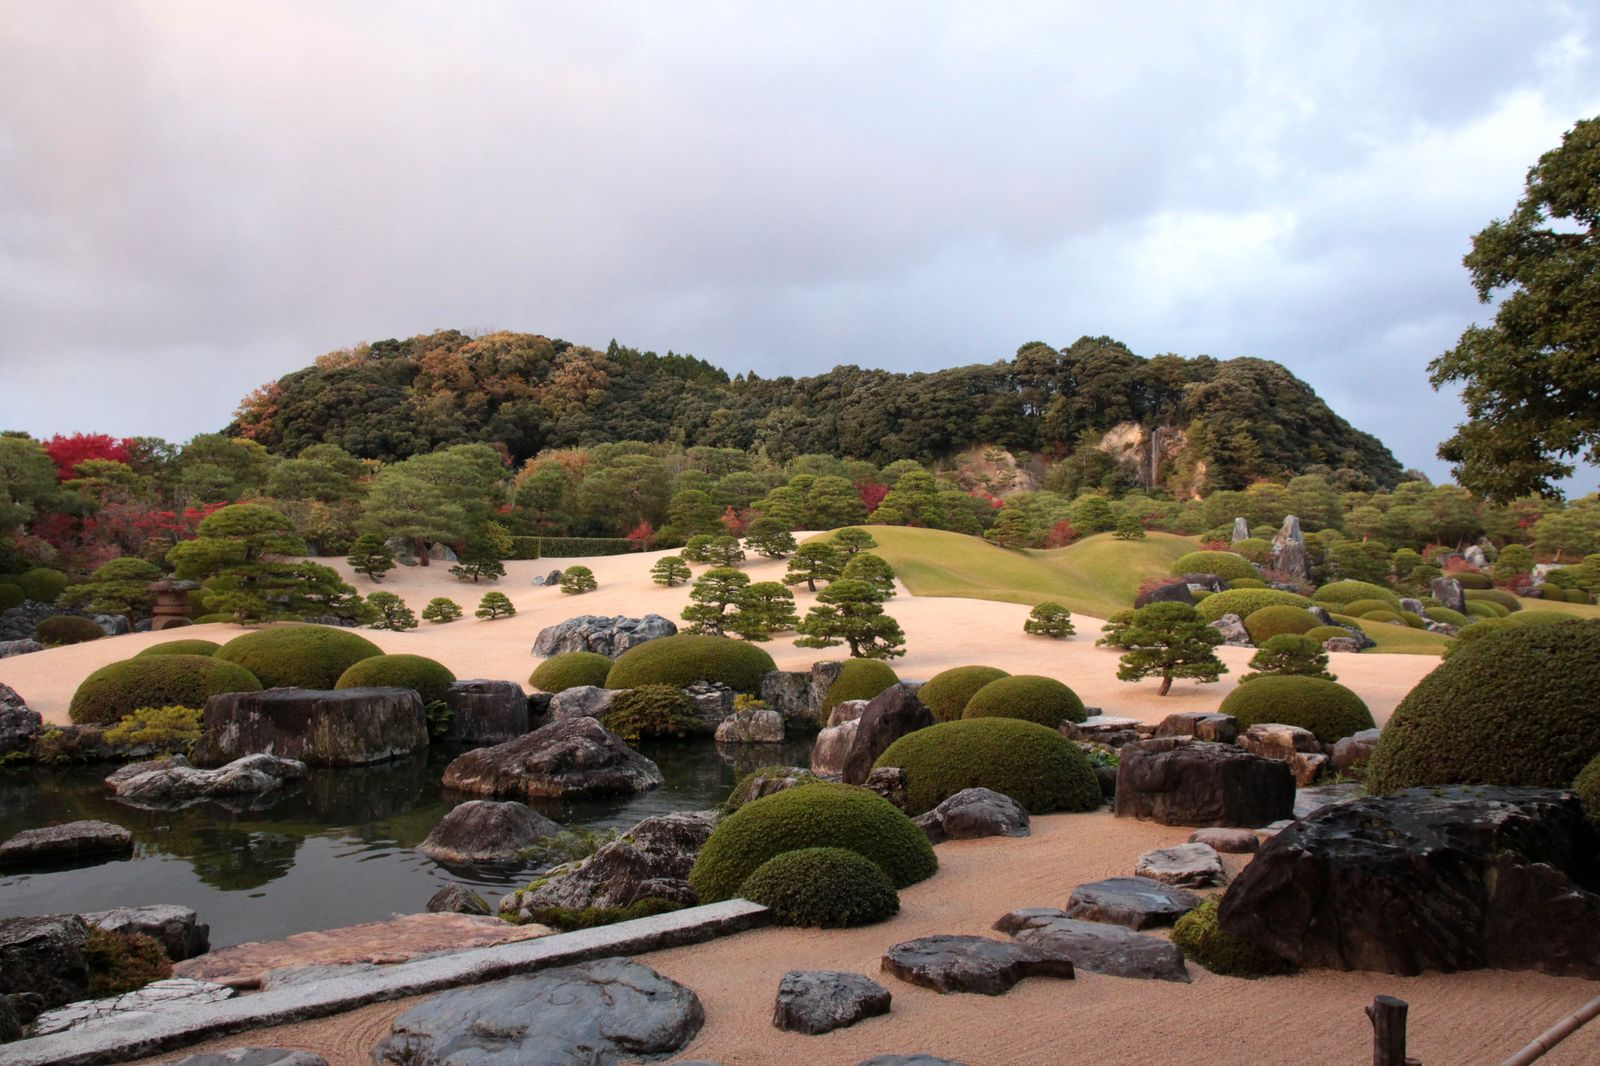 Bonsai Moravia Blog: JAPAN 2017 - #18 ADACHI MUSEUM, PART 2